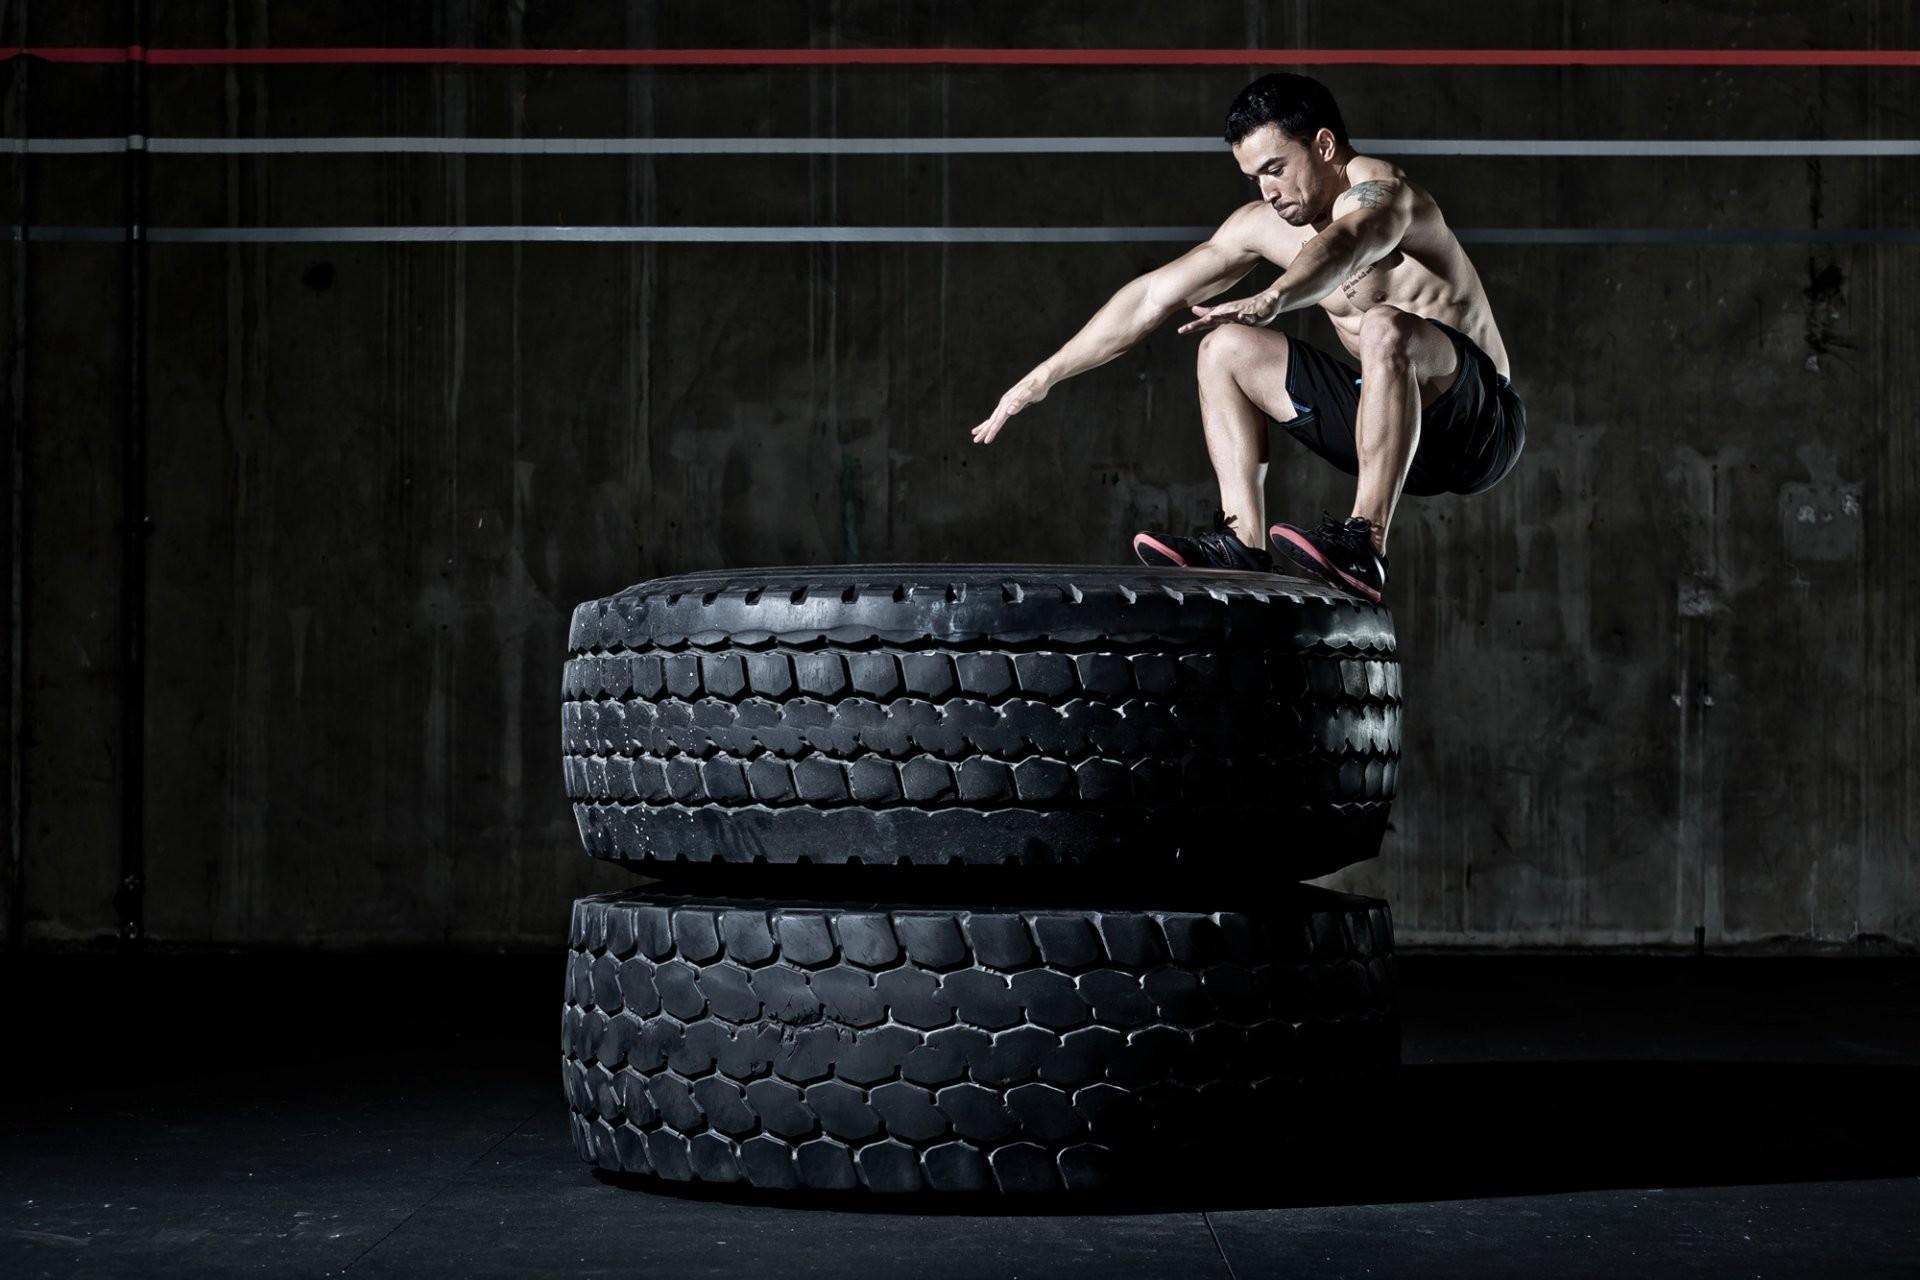 crossfit workout men